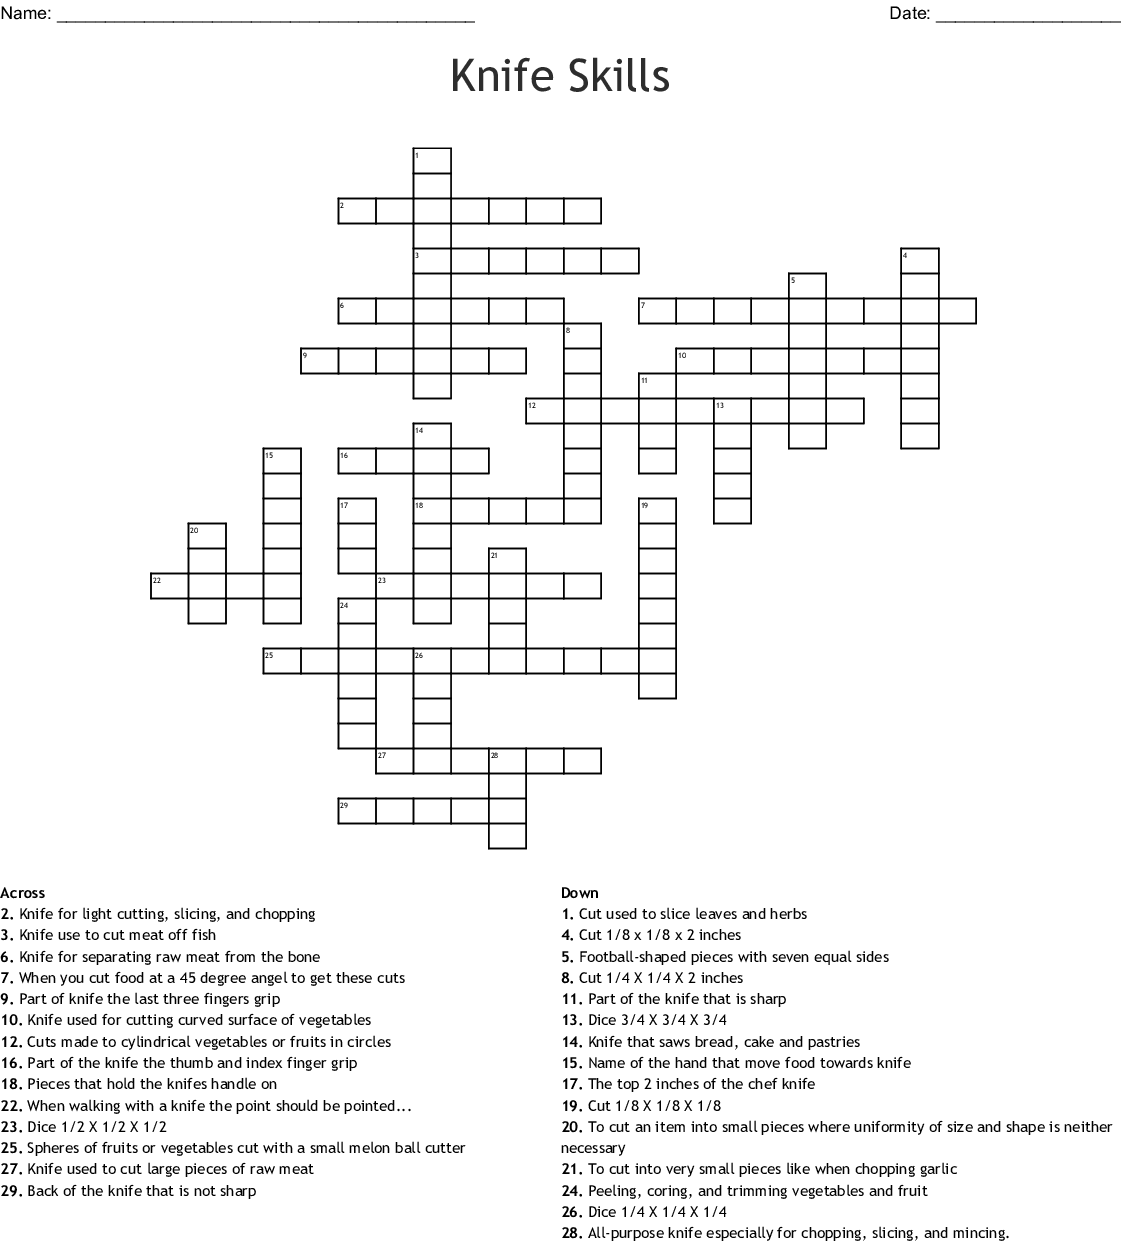 206 Bones By Kathy Reichs Crossword